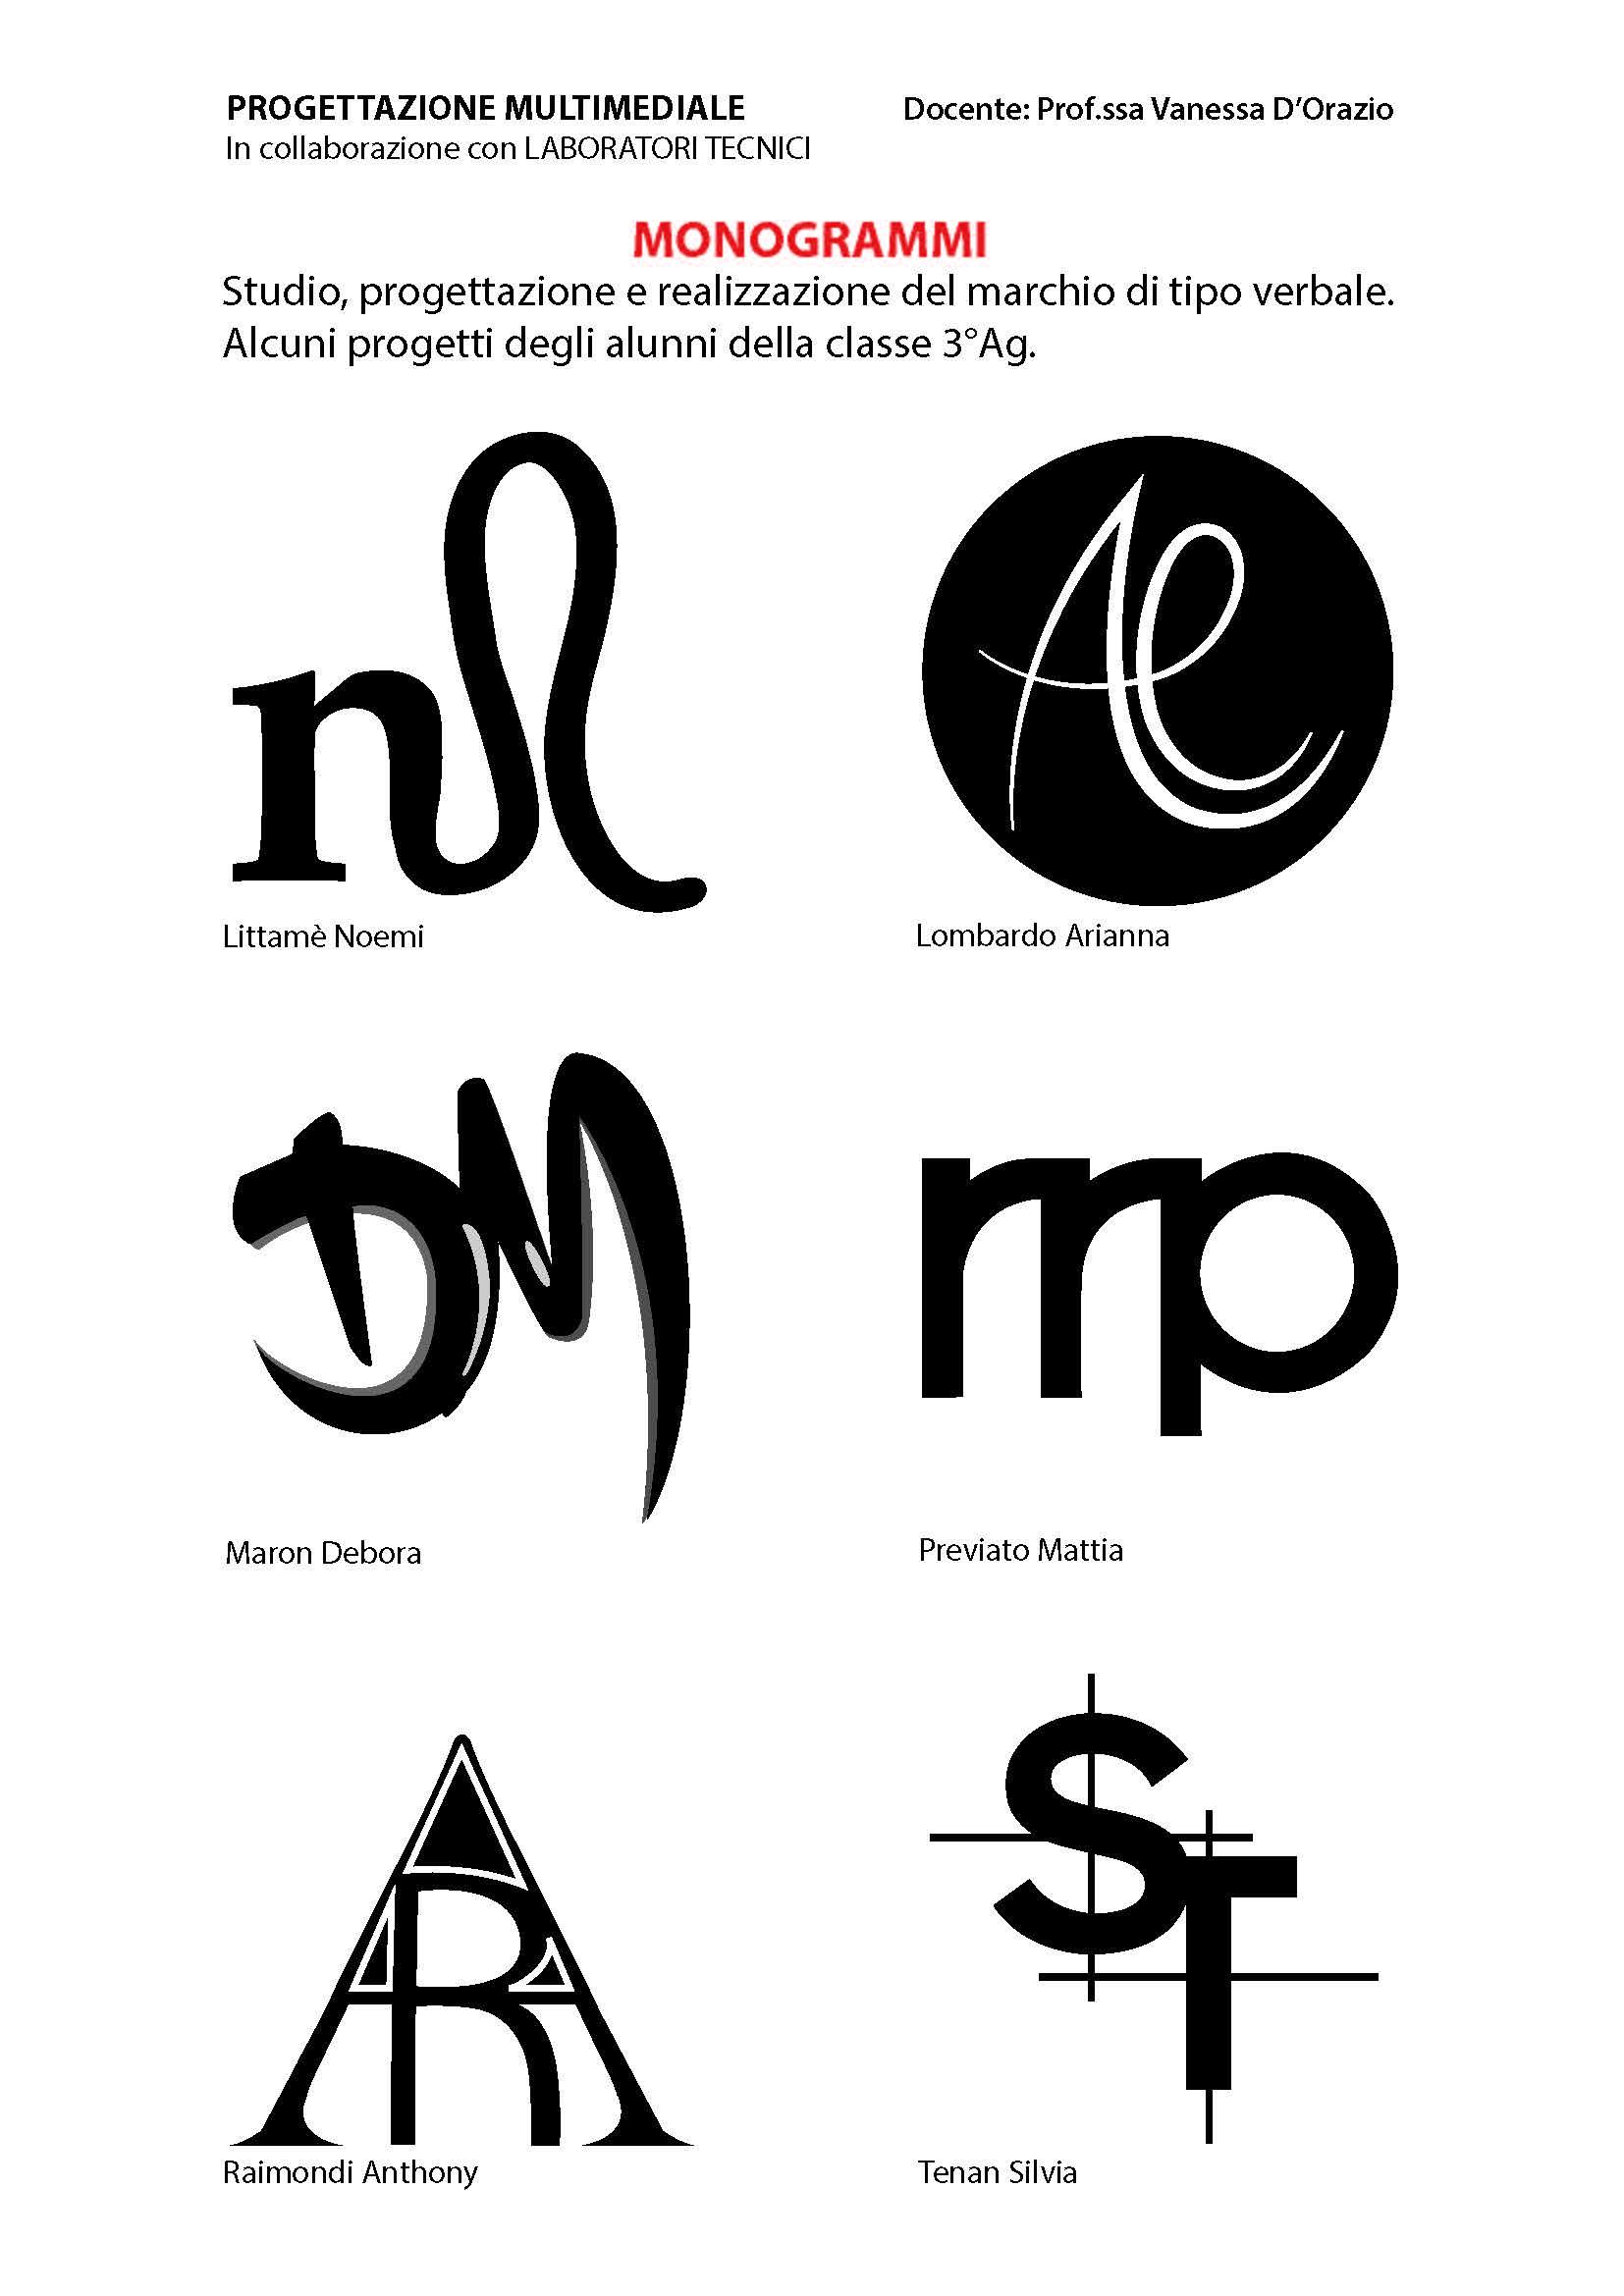 Monogrammi